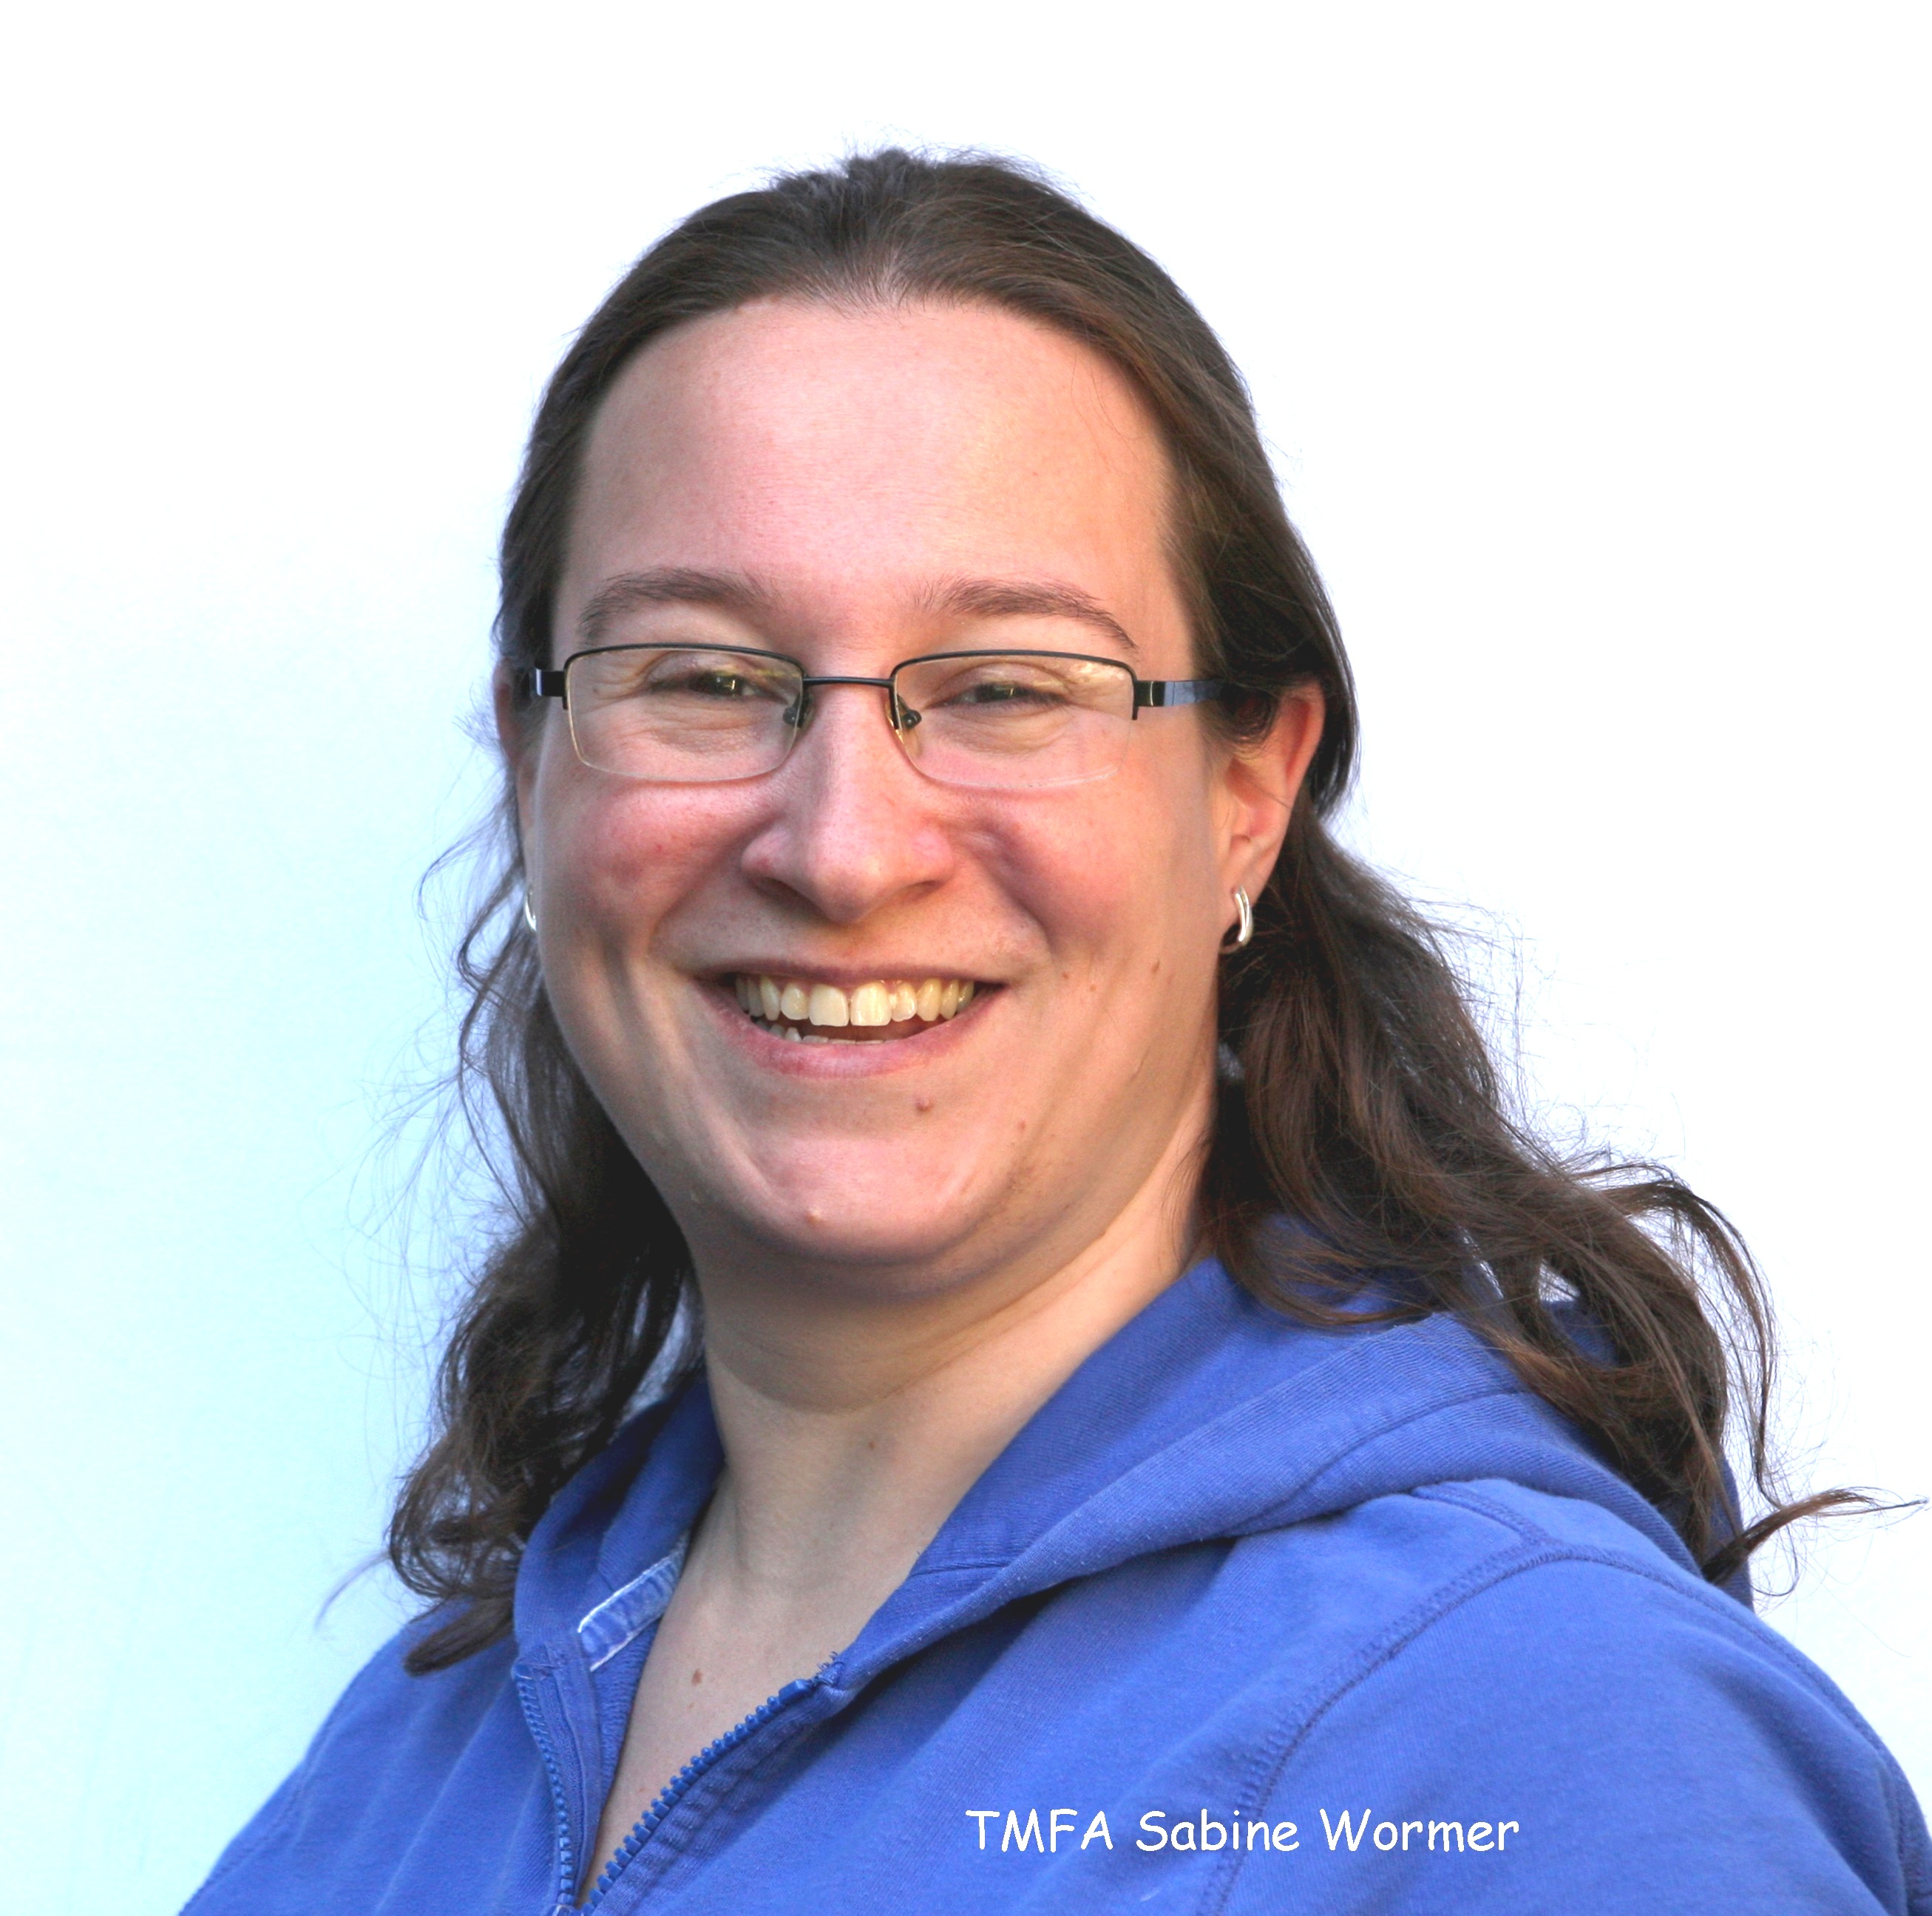 Sabine Wormer